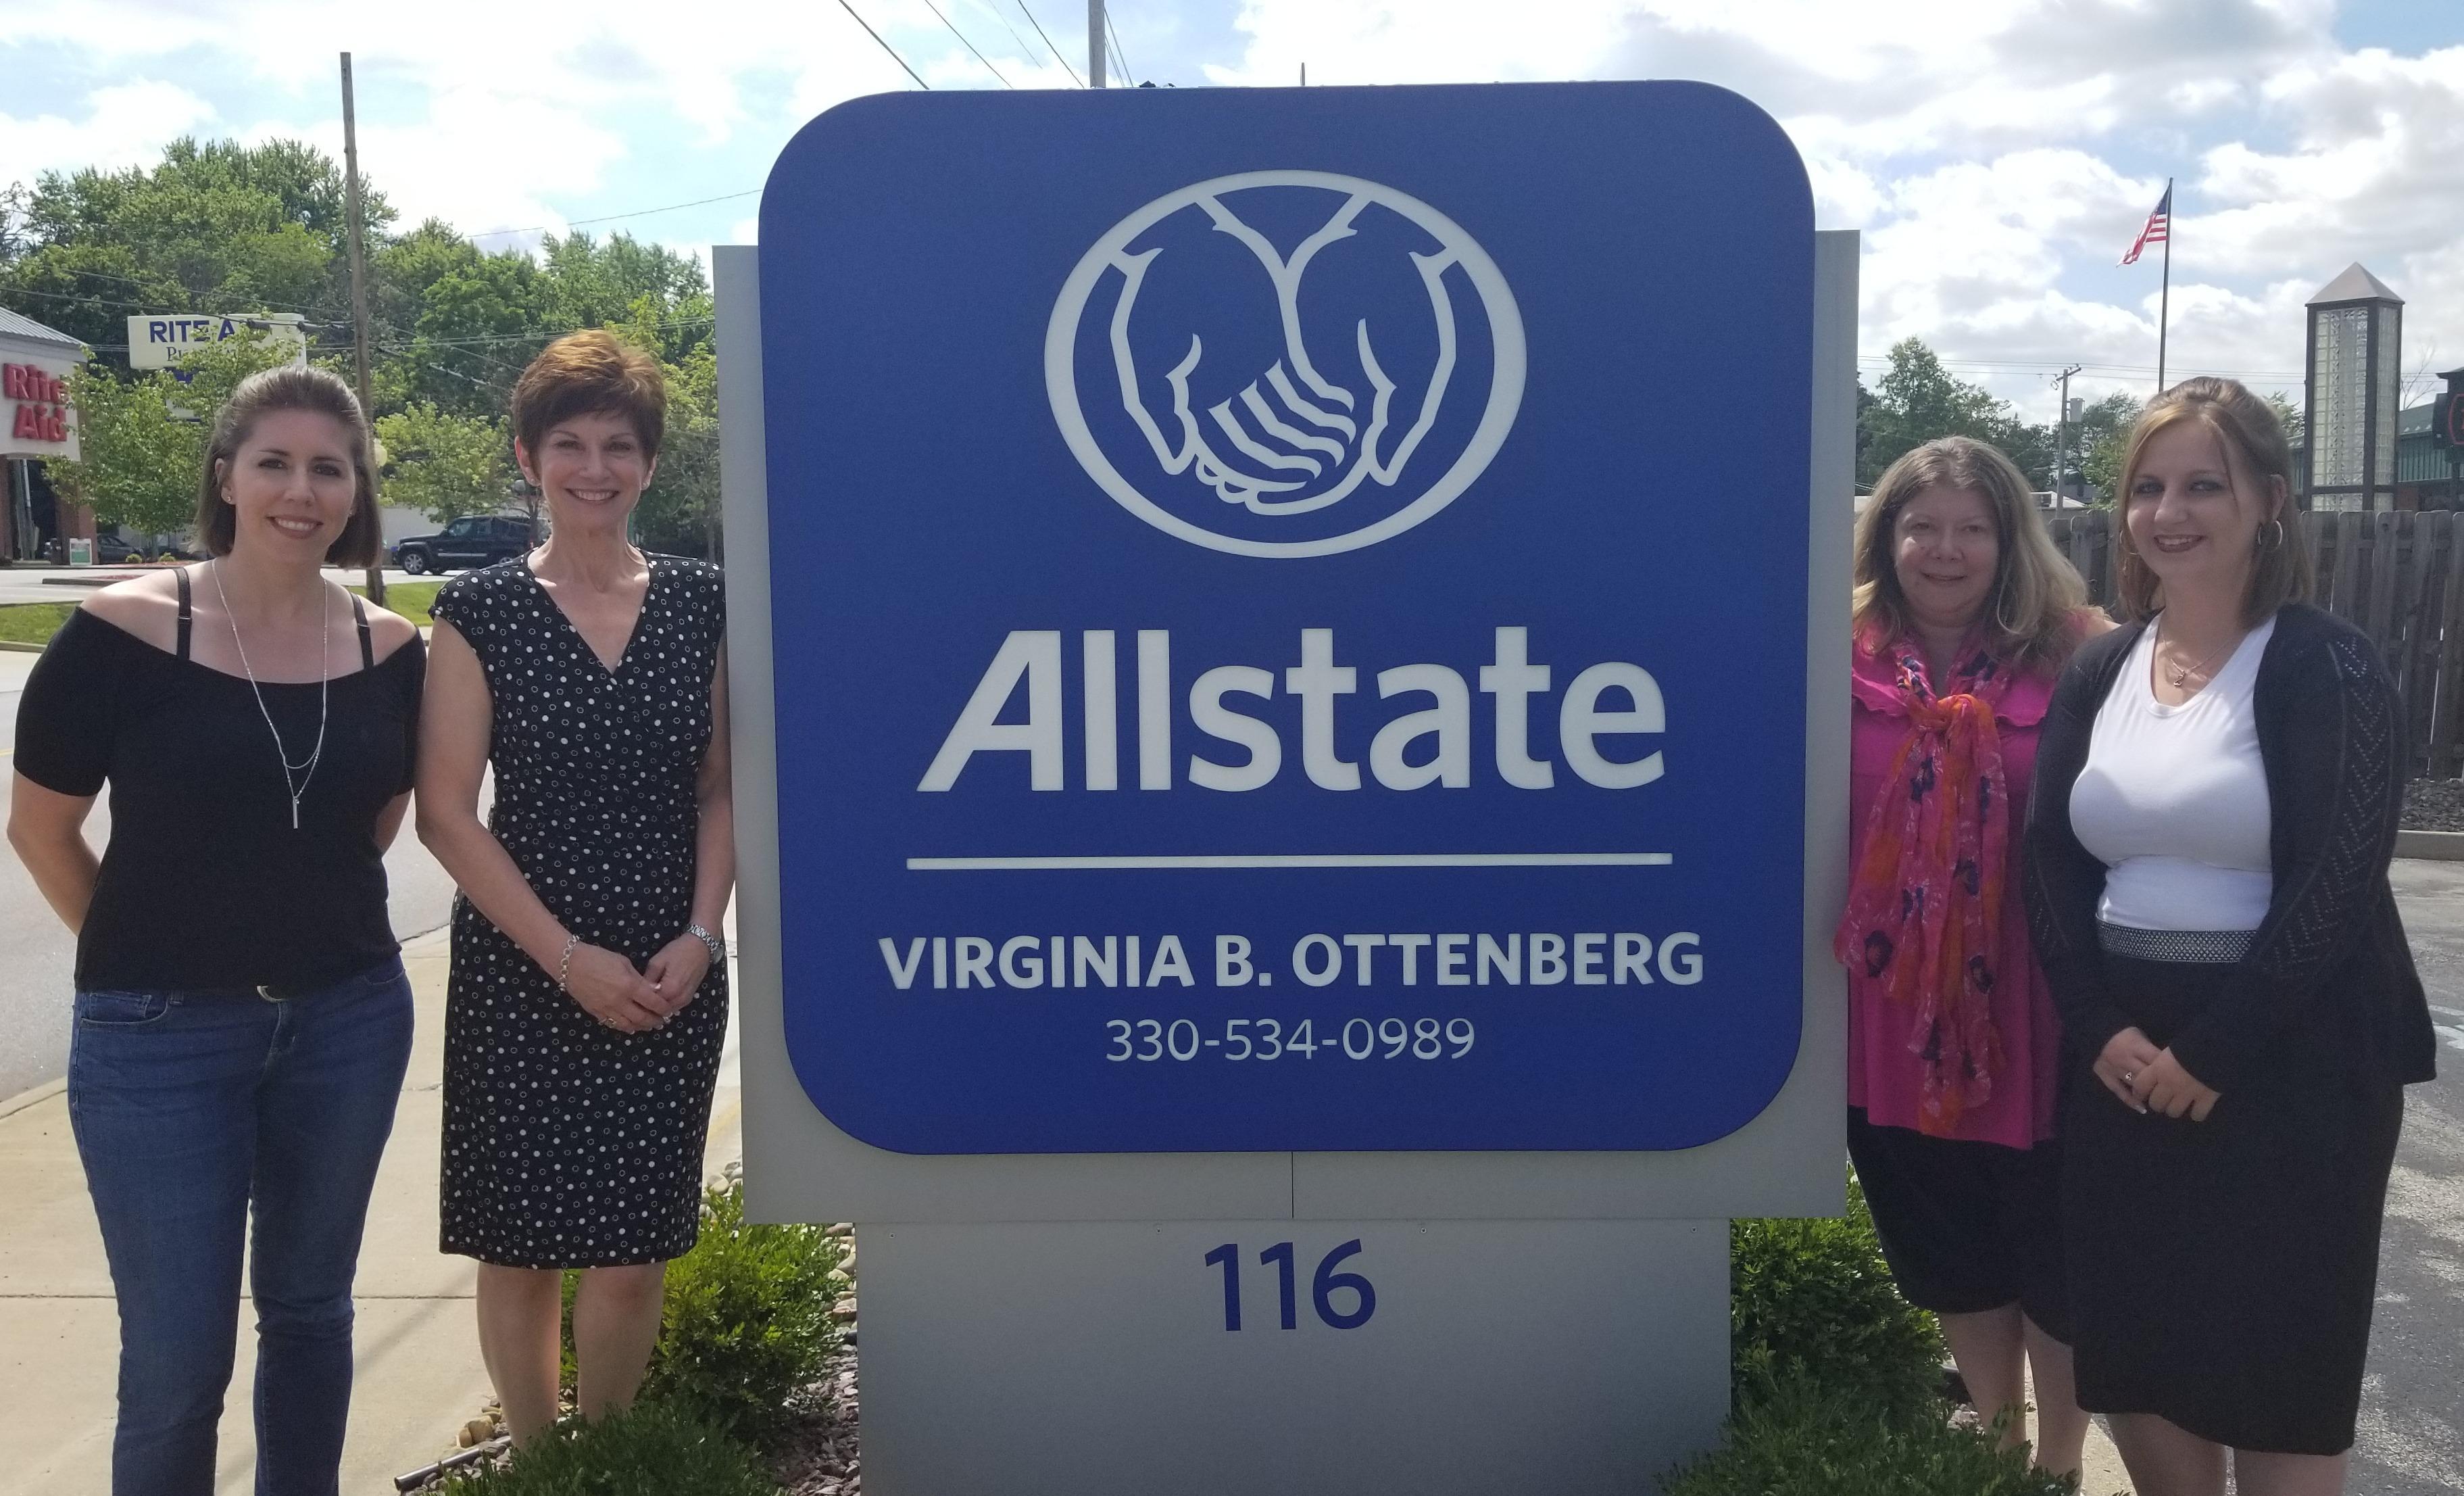 Virginia B Ottenberg: Allstate Insurance image 7